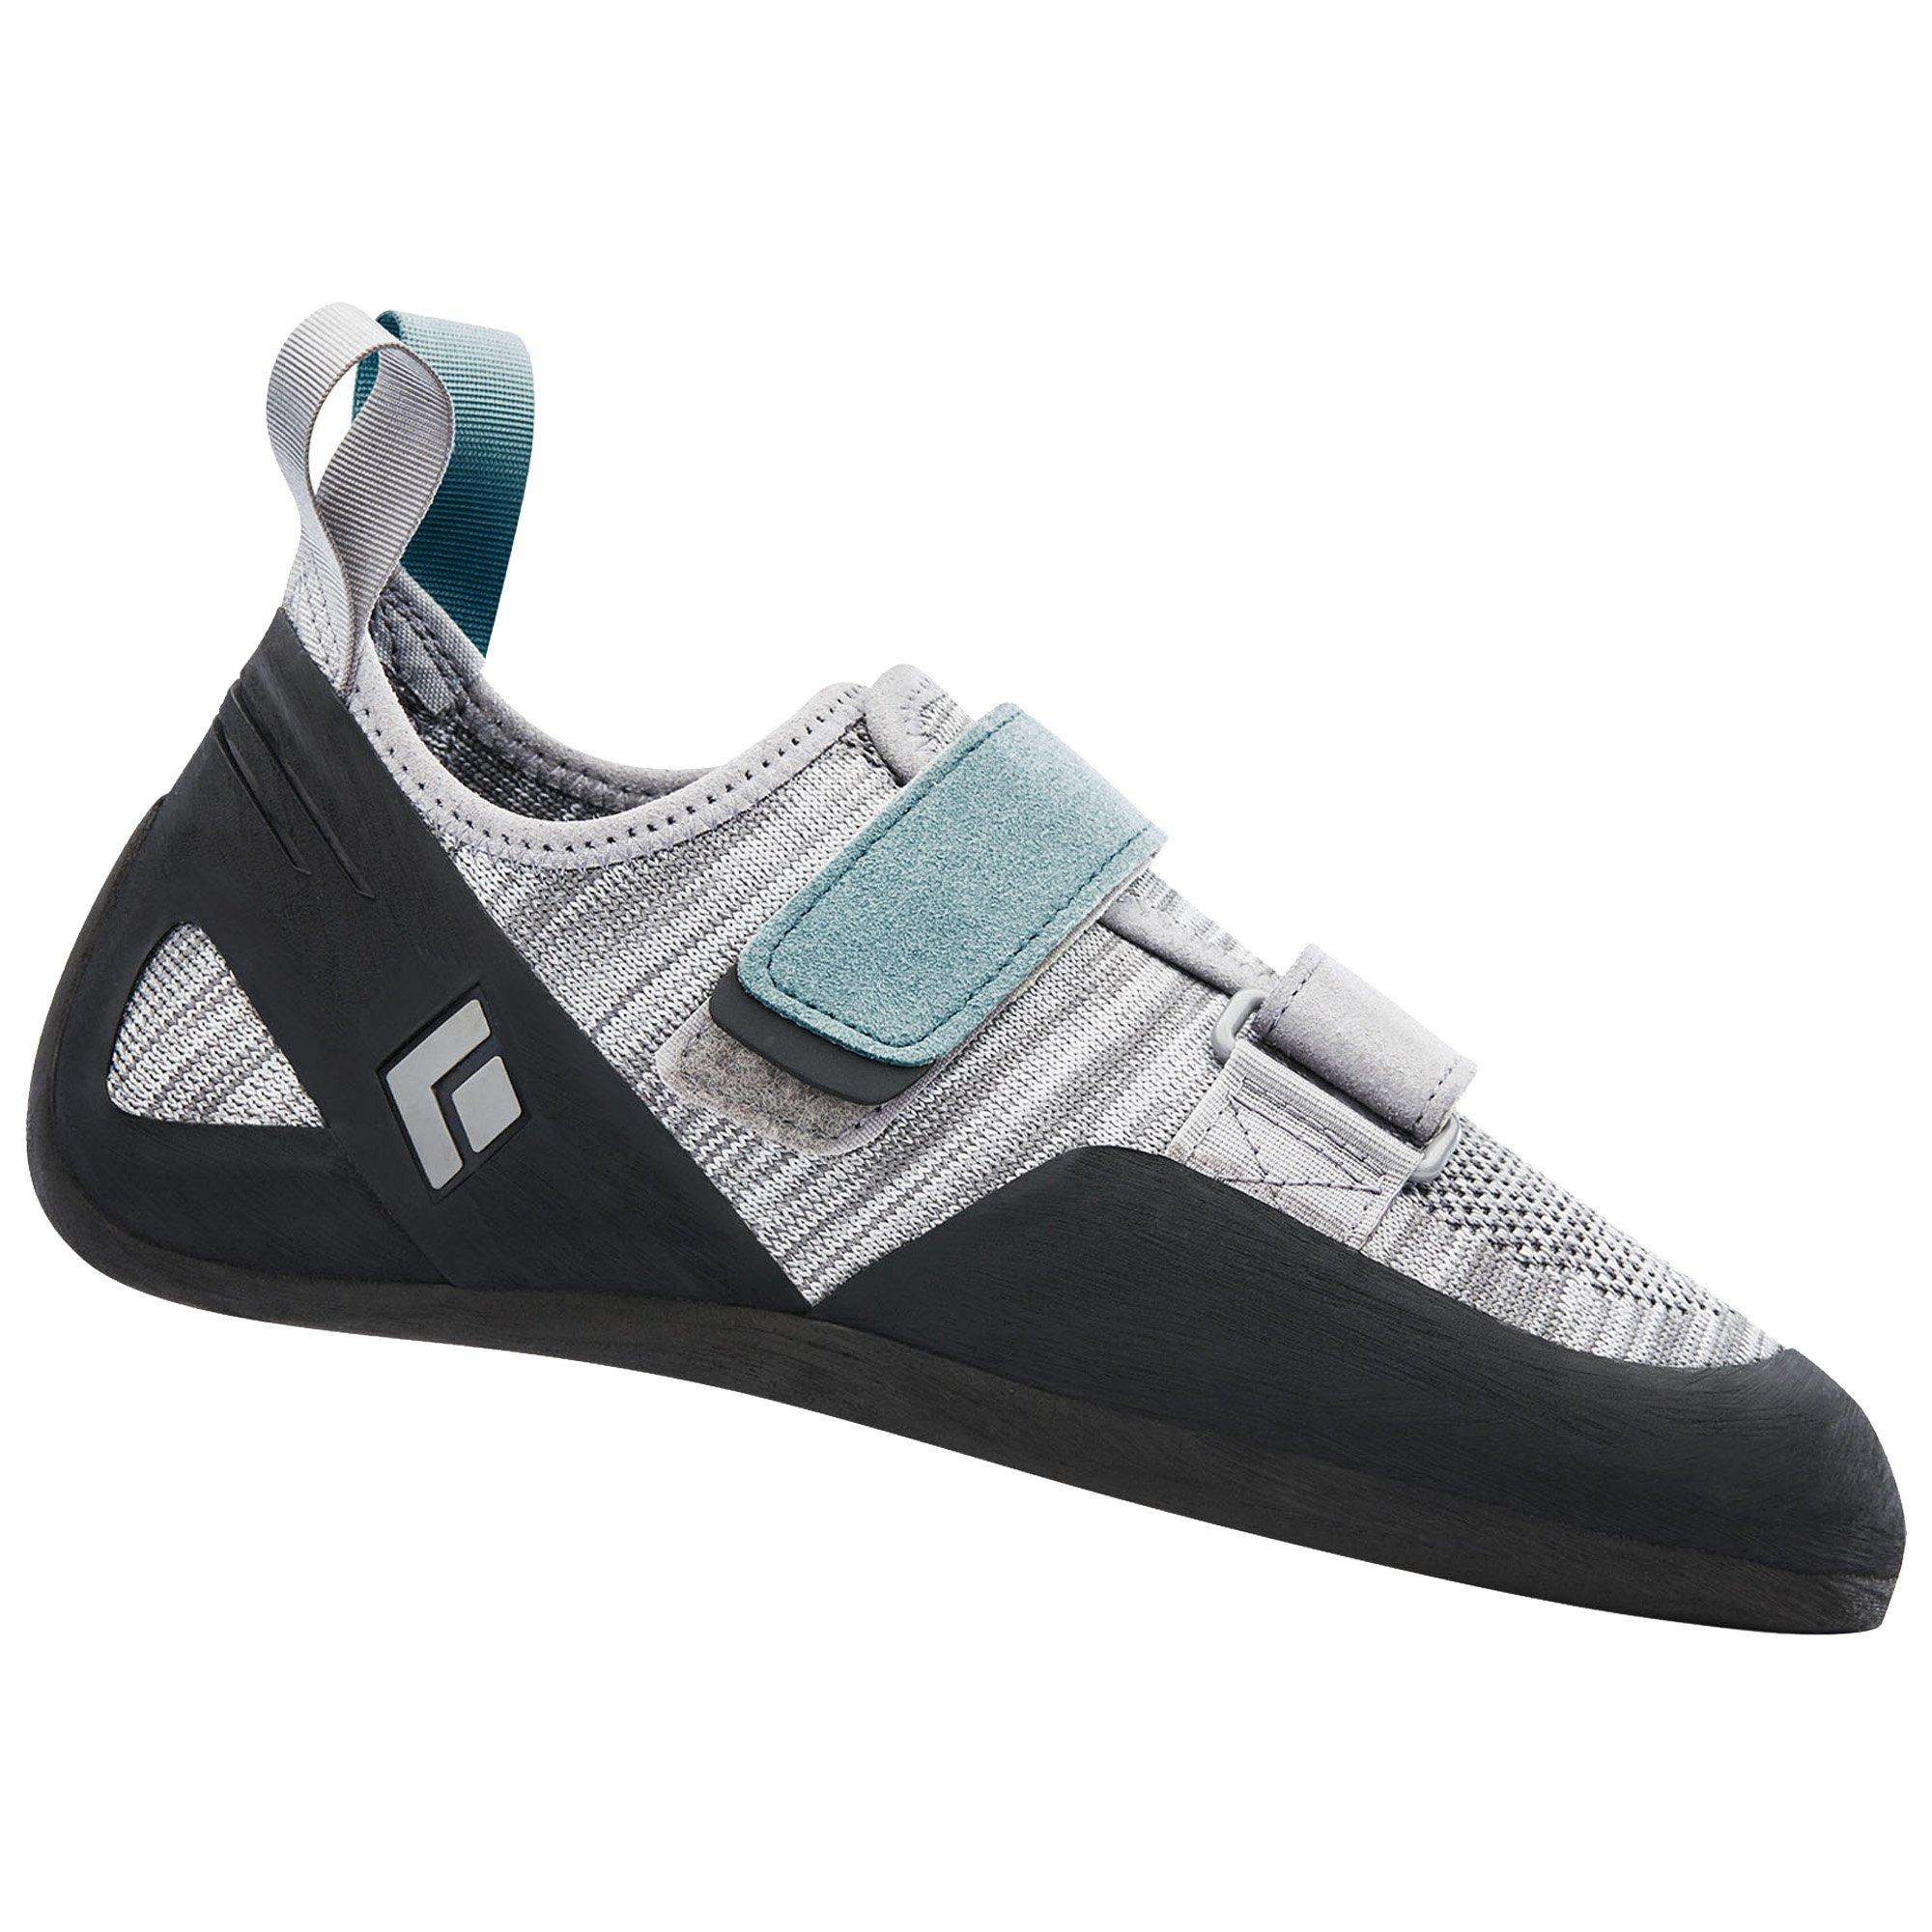 Black Diamond Momentum Climbing Shoe - Women's Aluminum 9